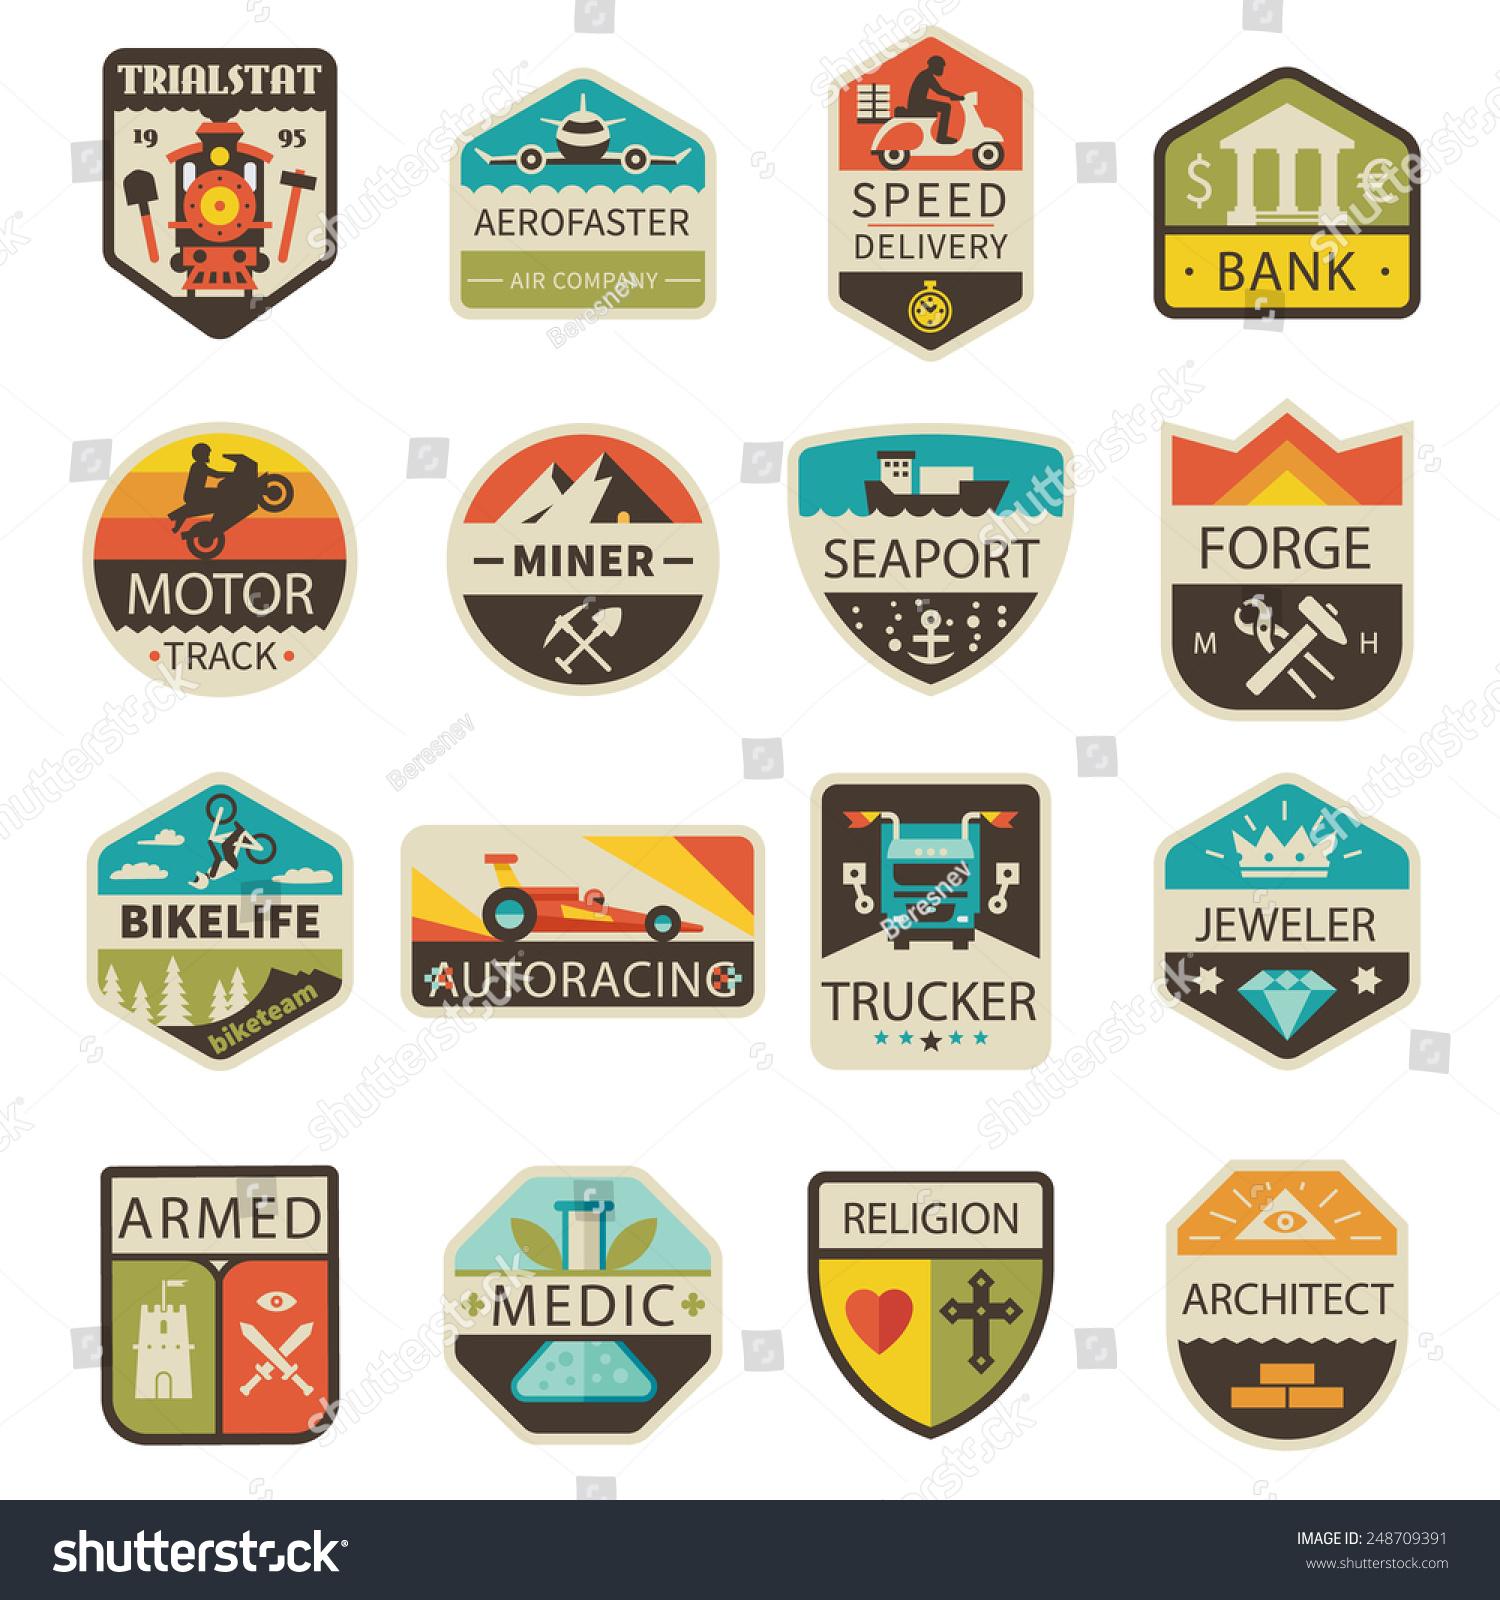 Vintage Premium Product Flat Badges Set:  Vintage Logos Badges Professions Transportation Vector